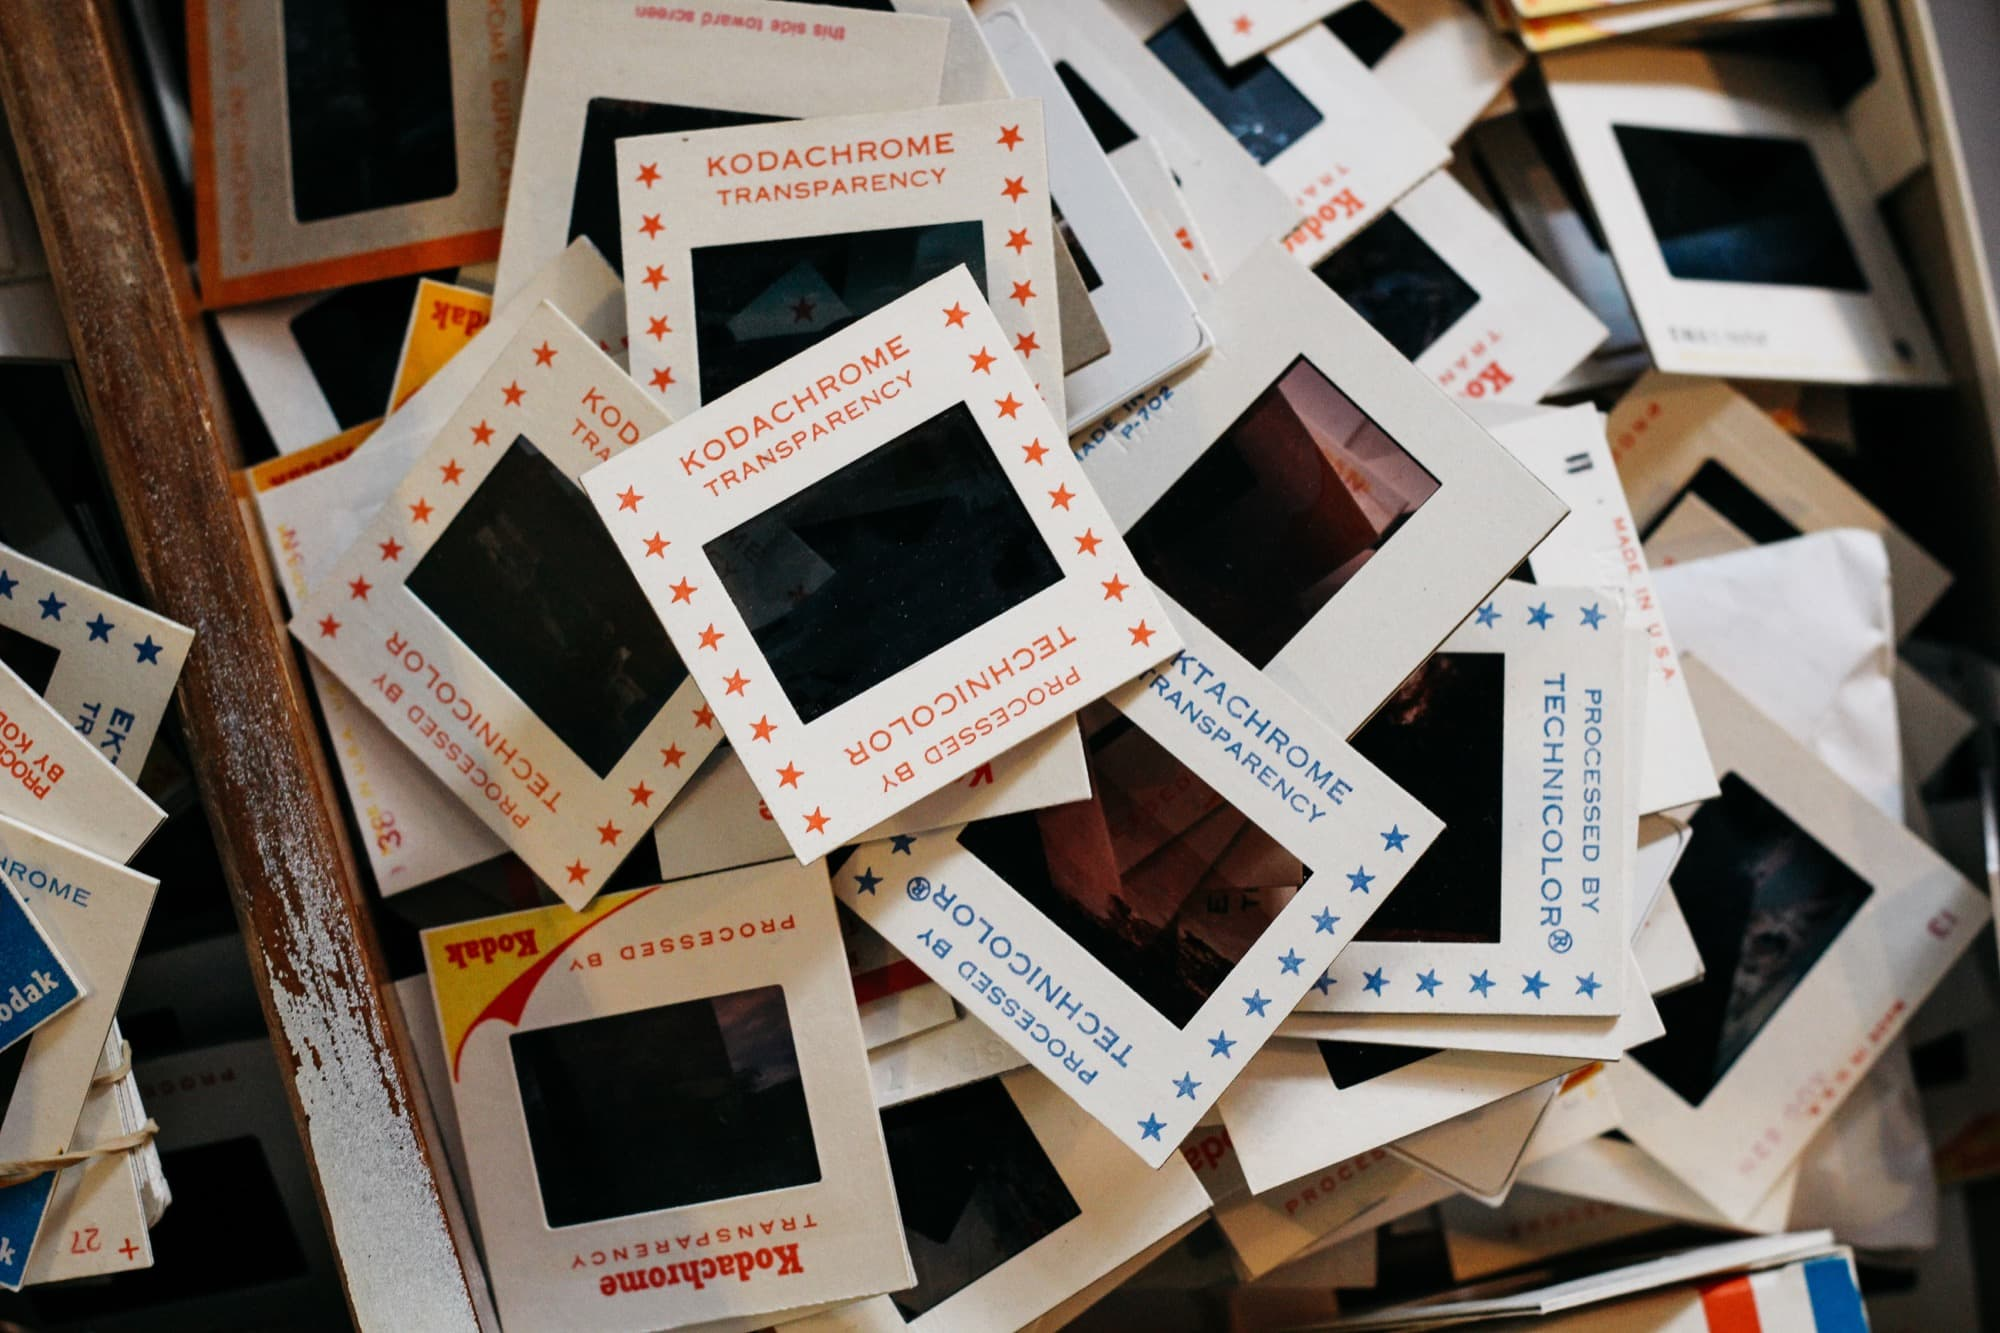 35mm slides in a heap